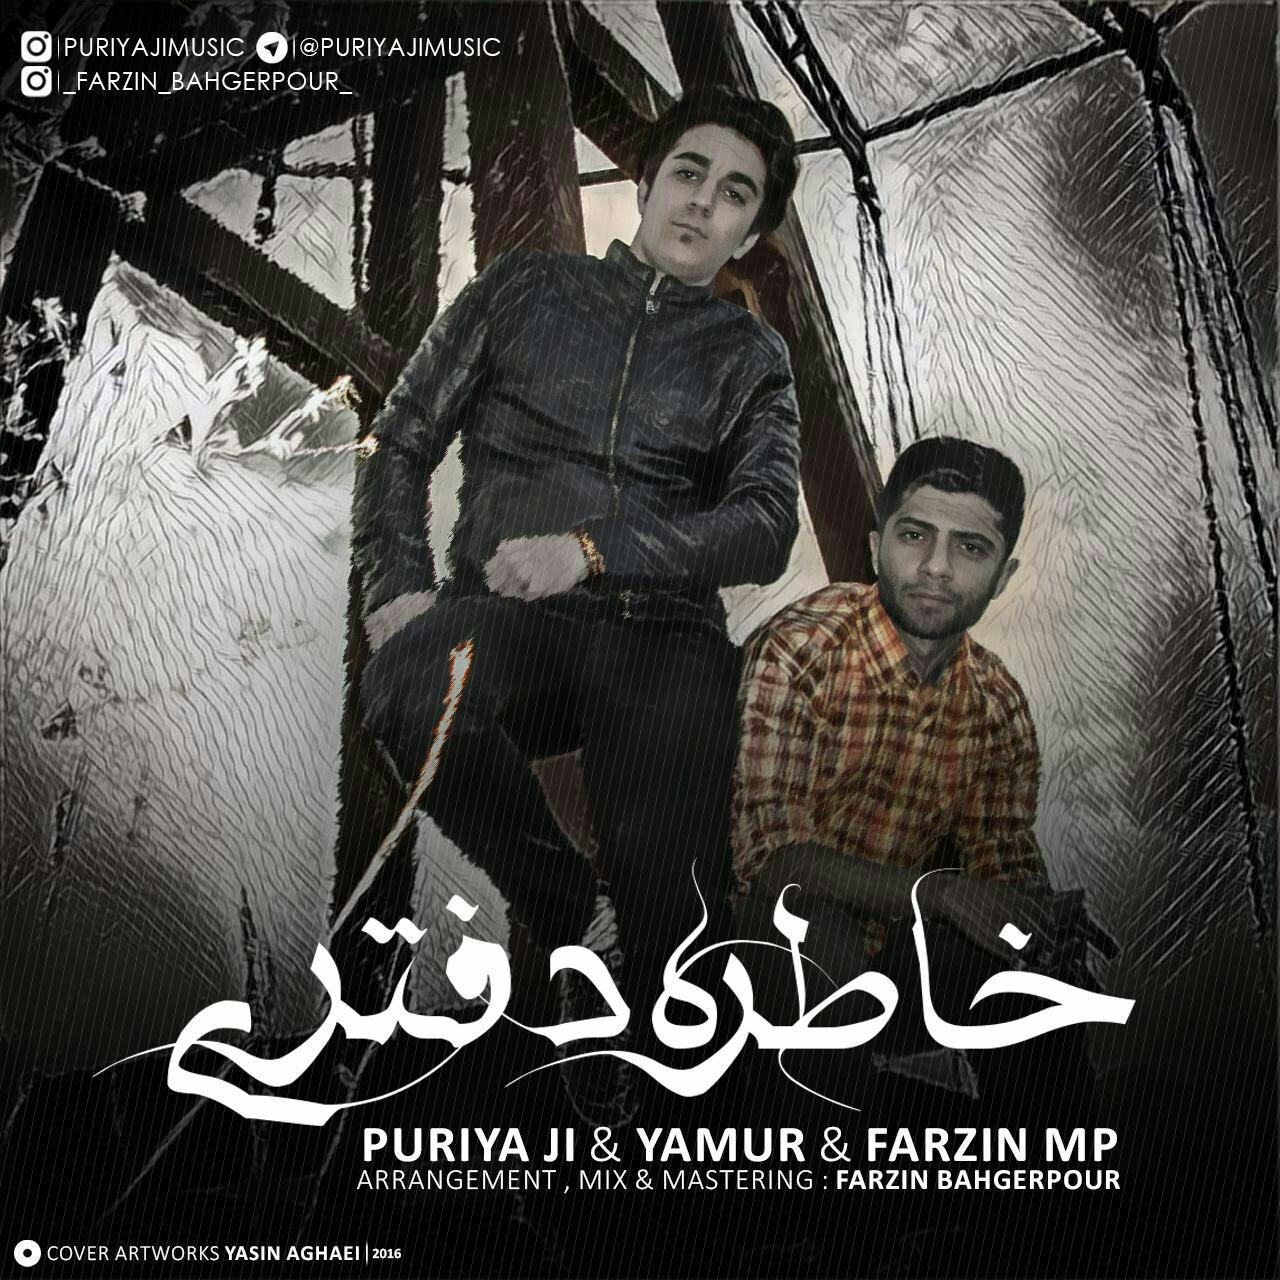 http://s8.picofile.com/file/8300924726/064Pouriya_Ji_Yamur_Farzin_Mp_Kahtire_Daftari.jpg